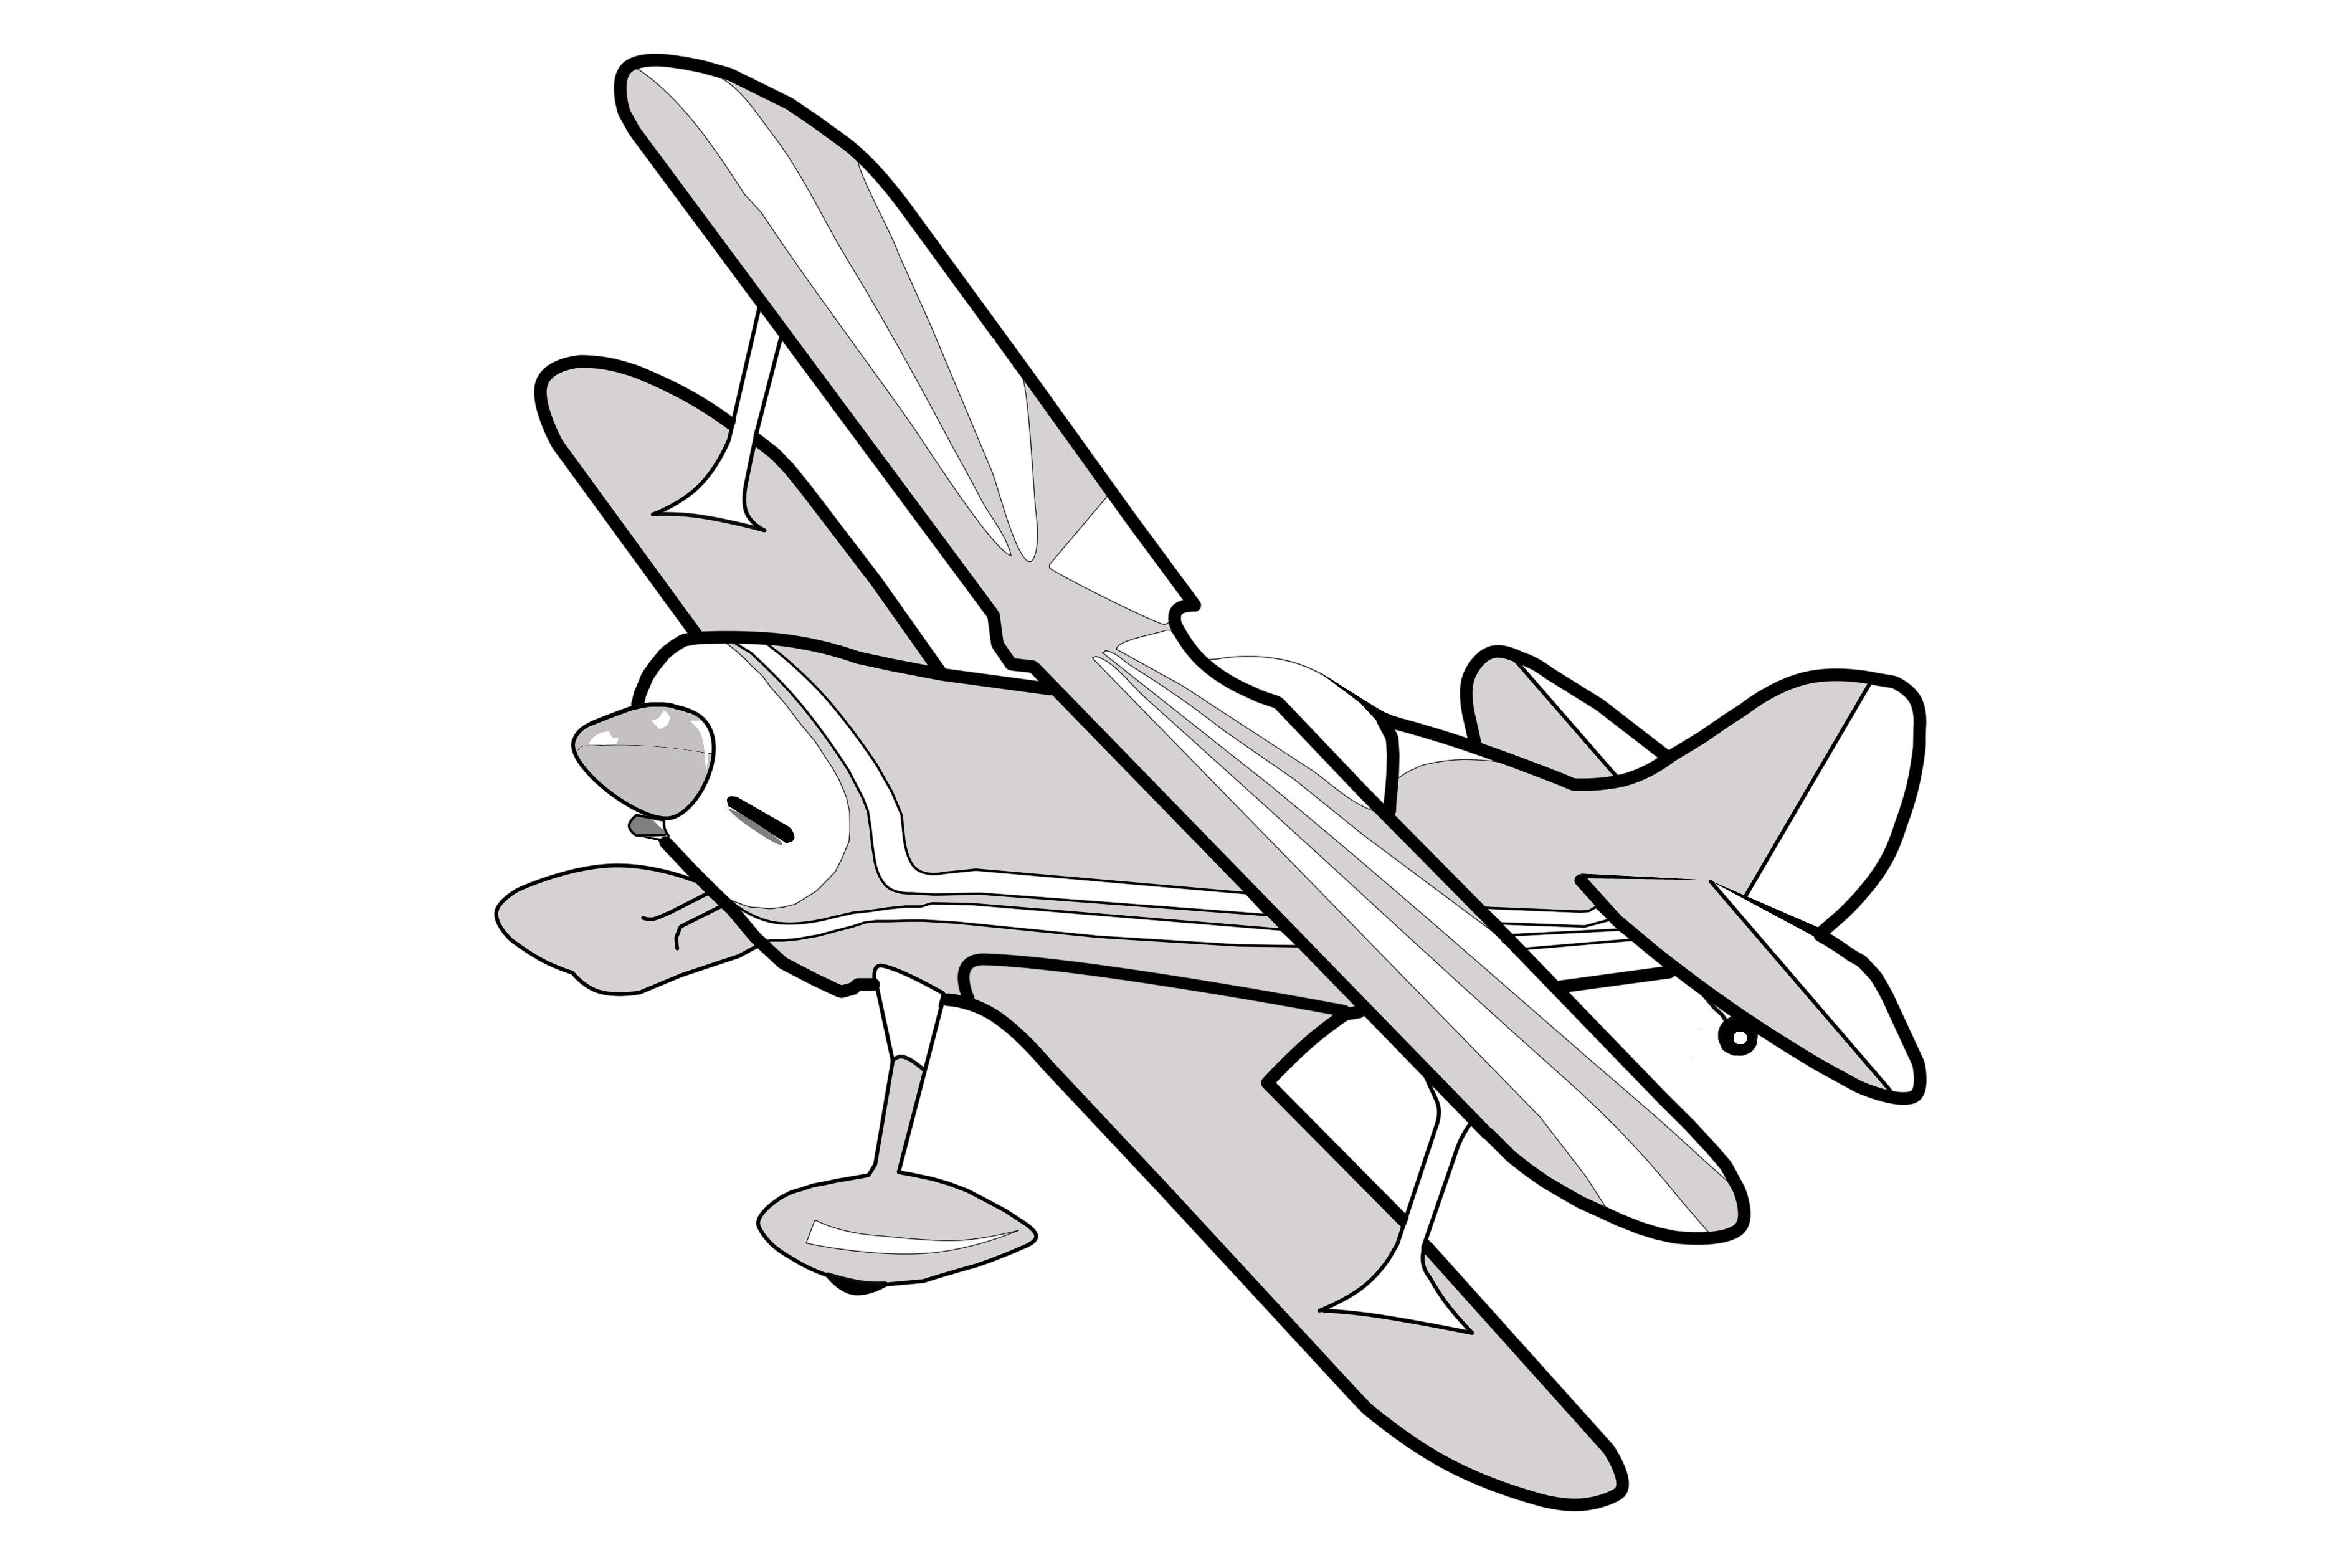 Free Biplane Cliparts, Download Free Clip Art, Free Clip Art.